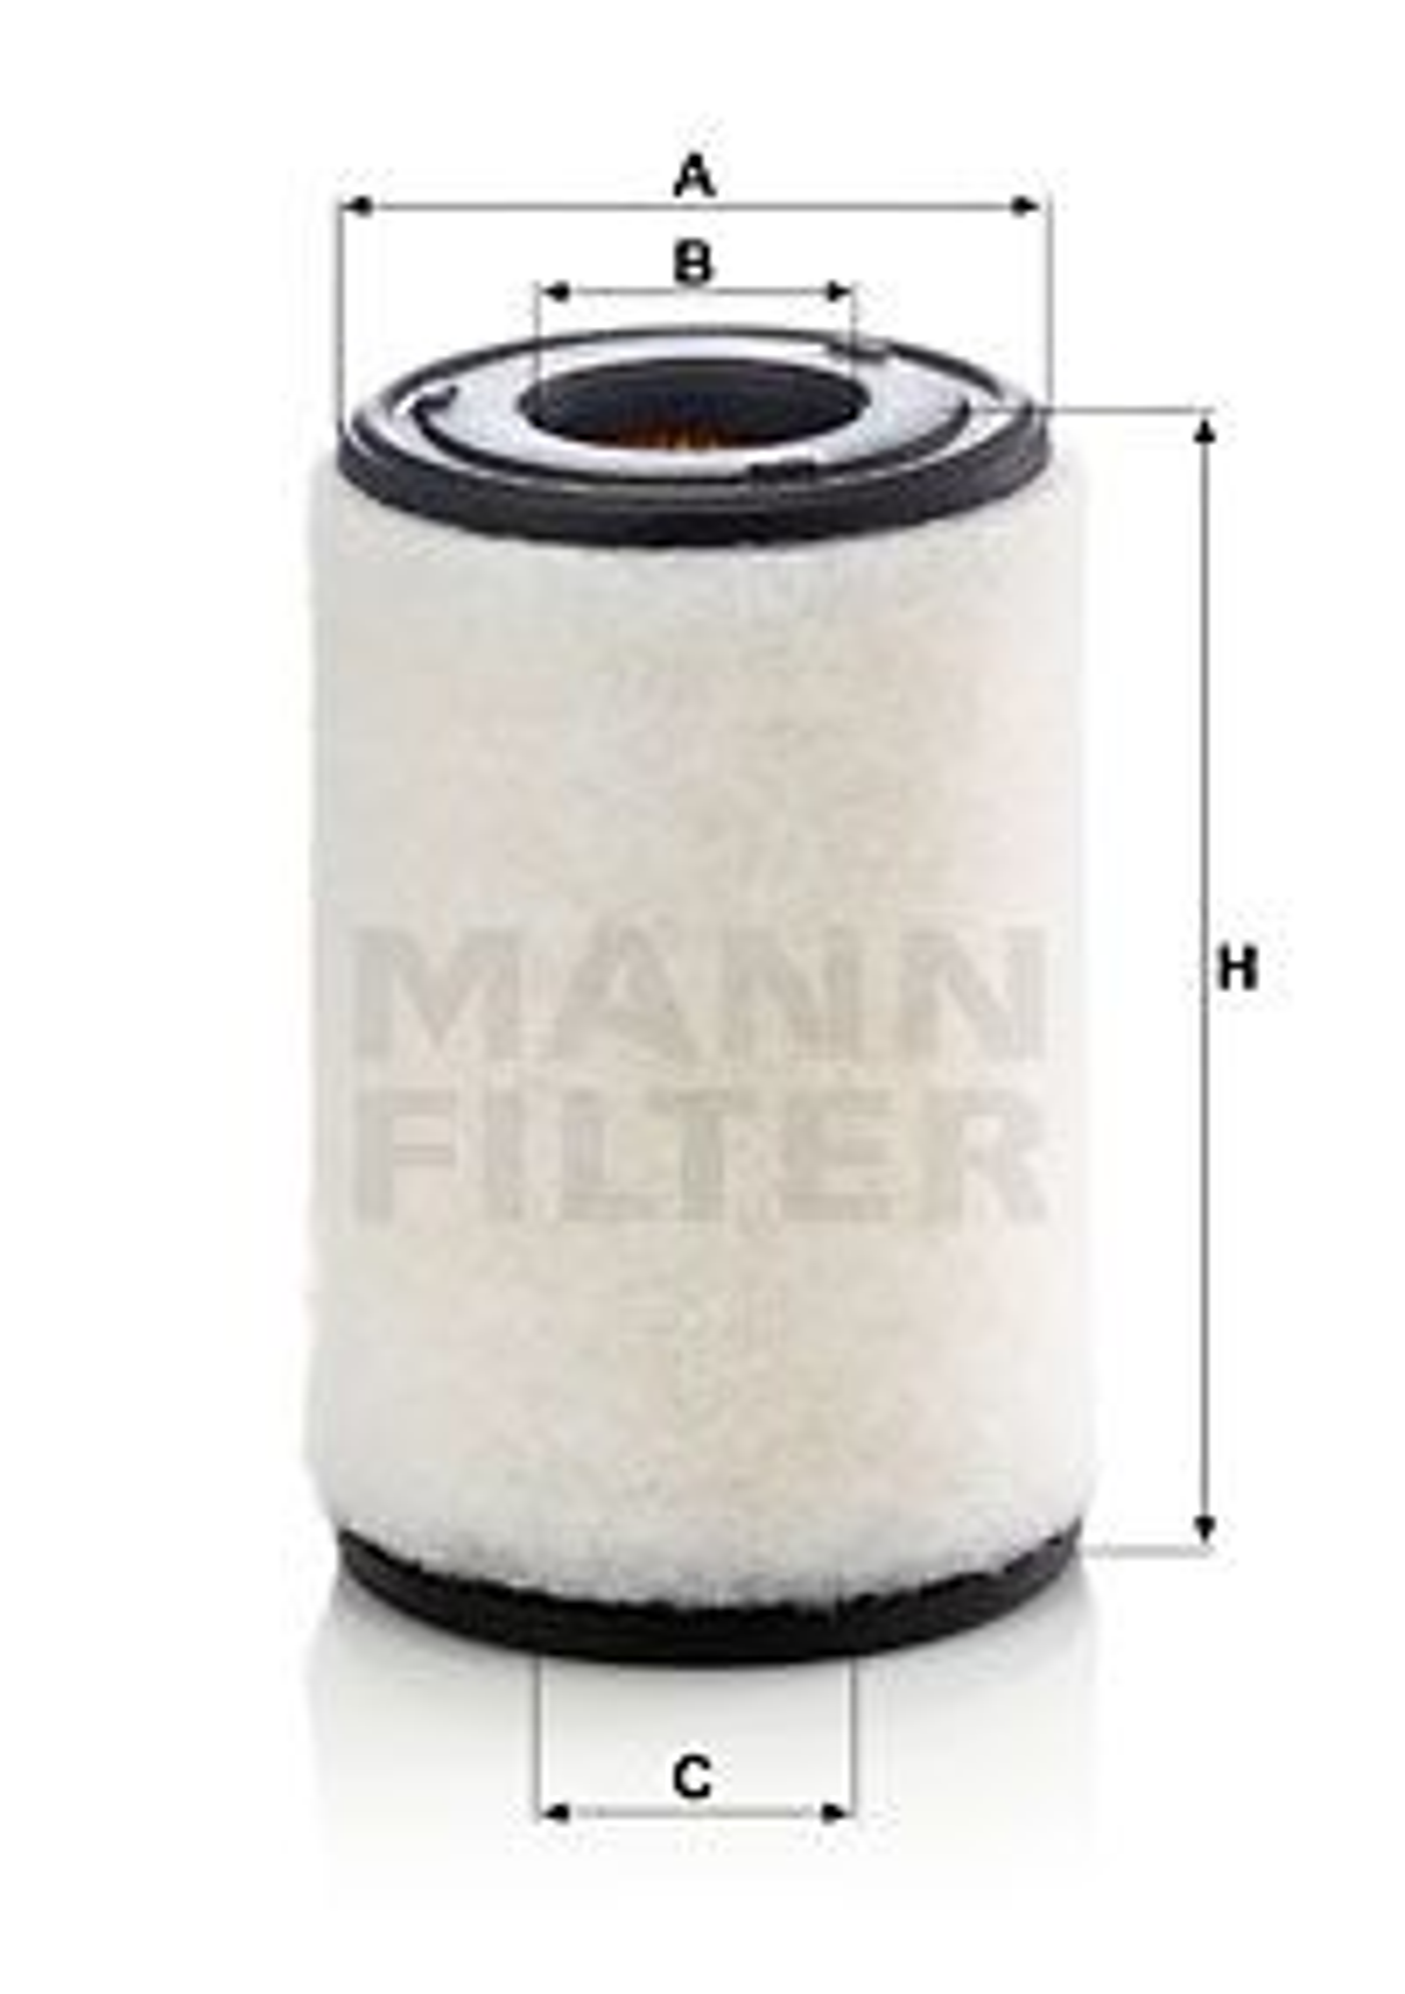 NISSAN NP300 PICKUP 2019 Luftfilter - Original MANN-FILTER C 14 011 Höhe: 228mm